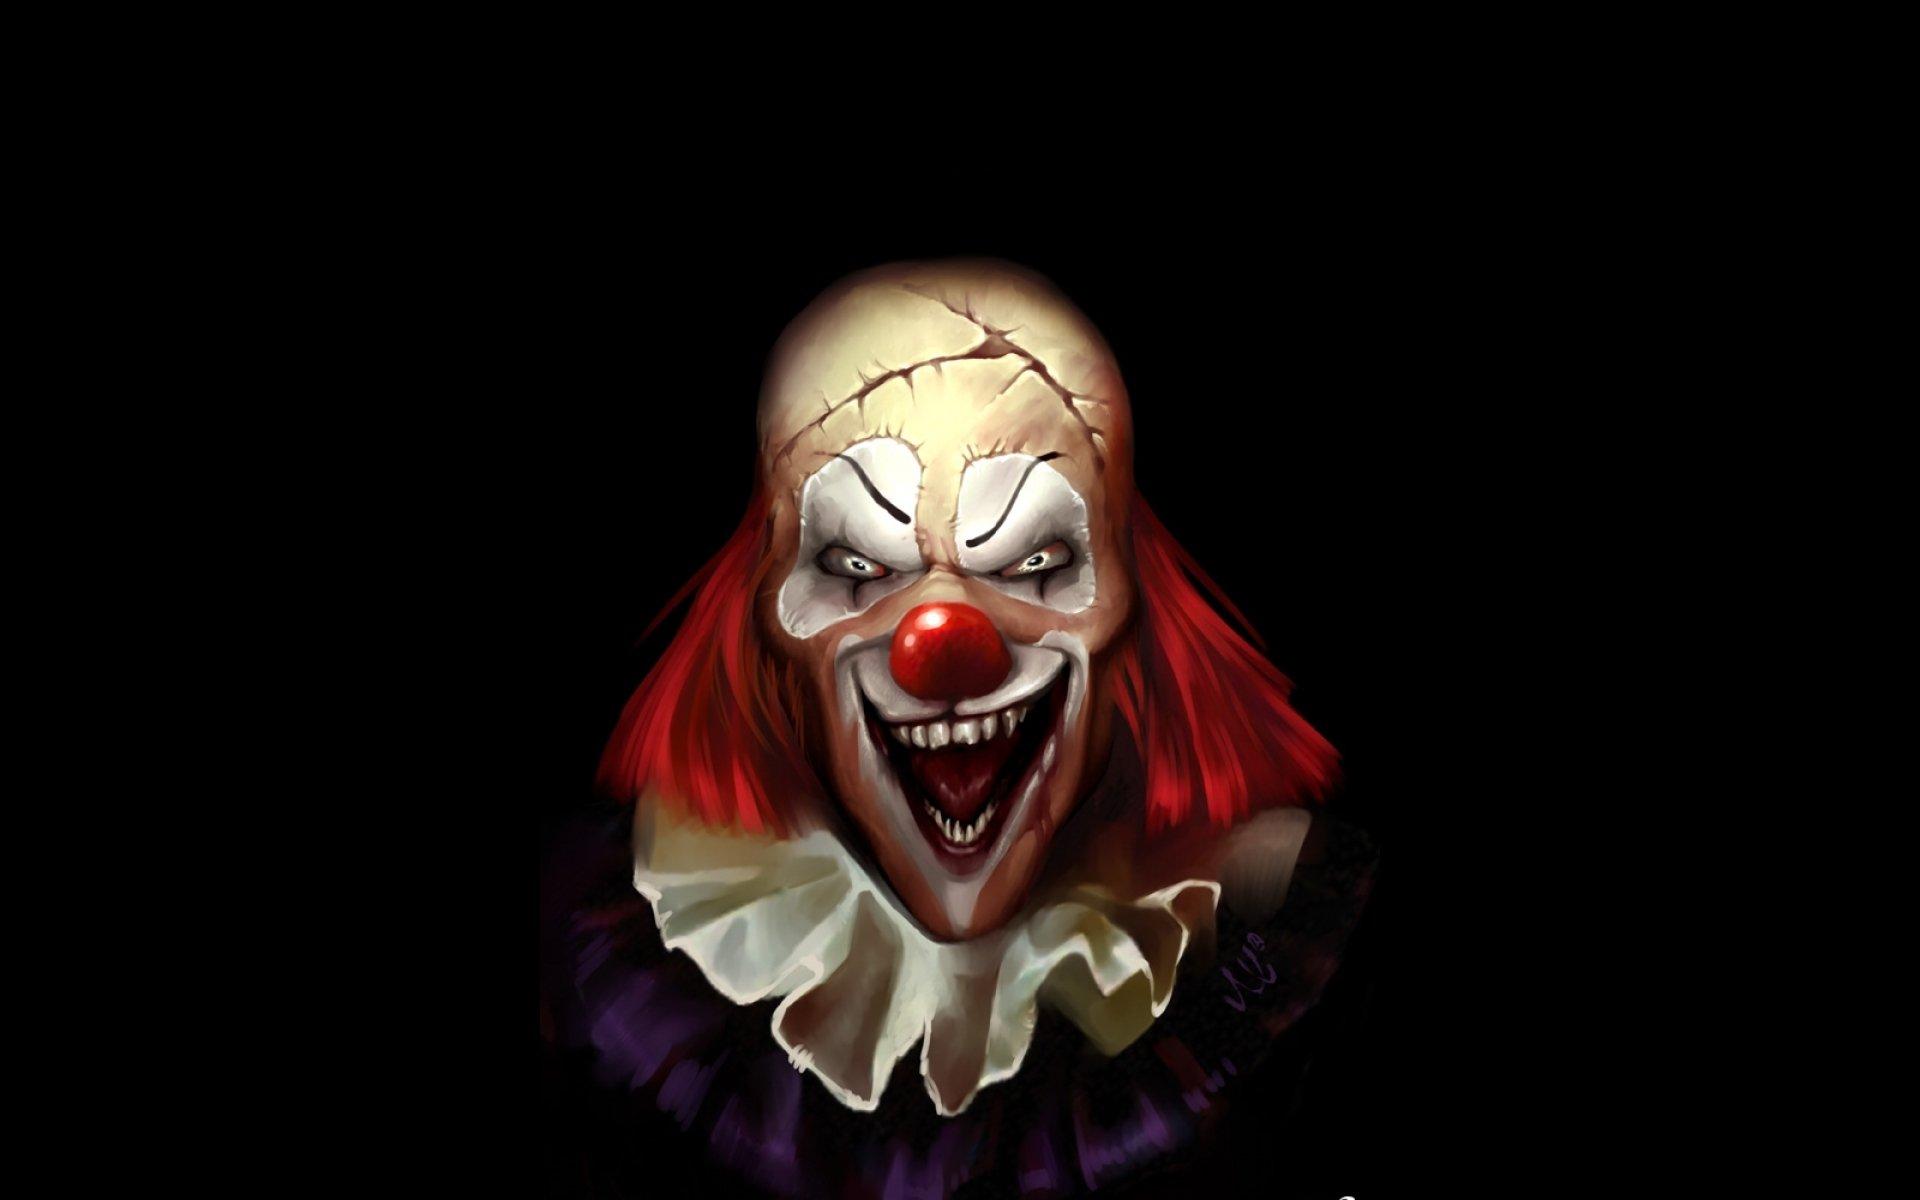 Dark horror evil clown art artwork f wallpaper | 1920x1200 ...